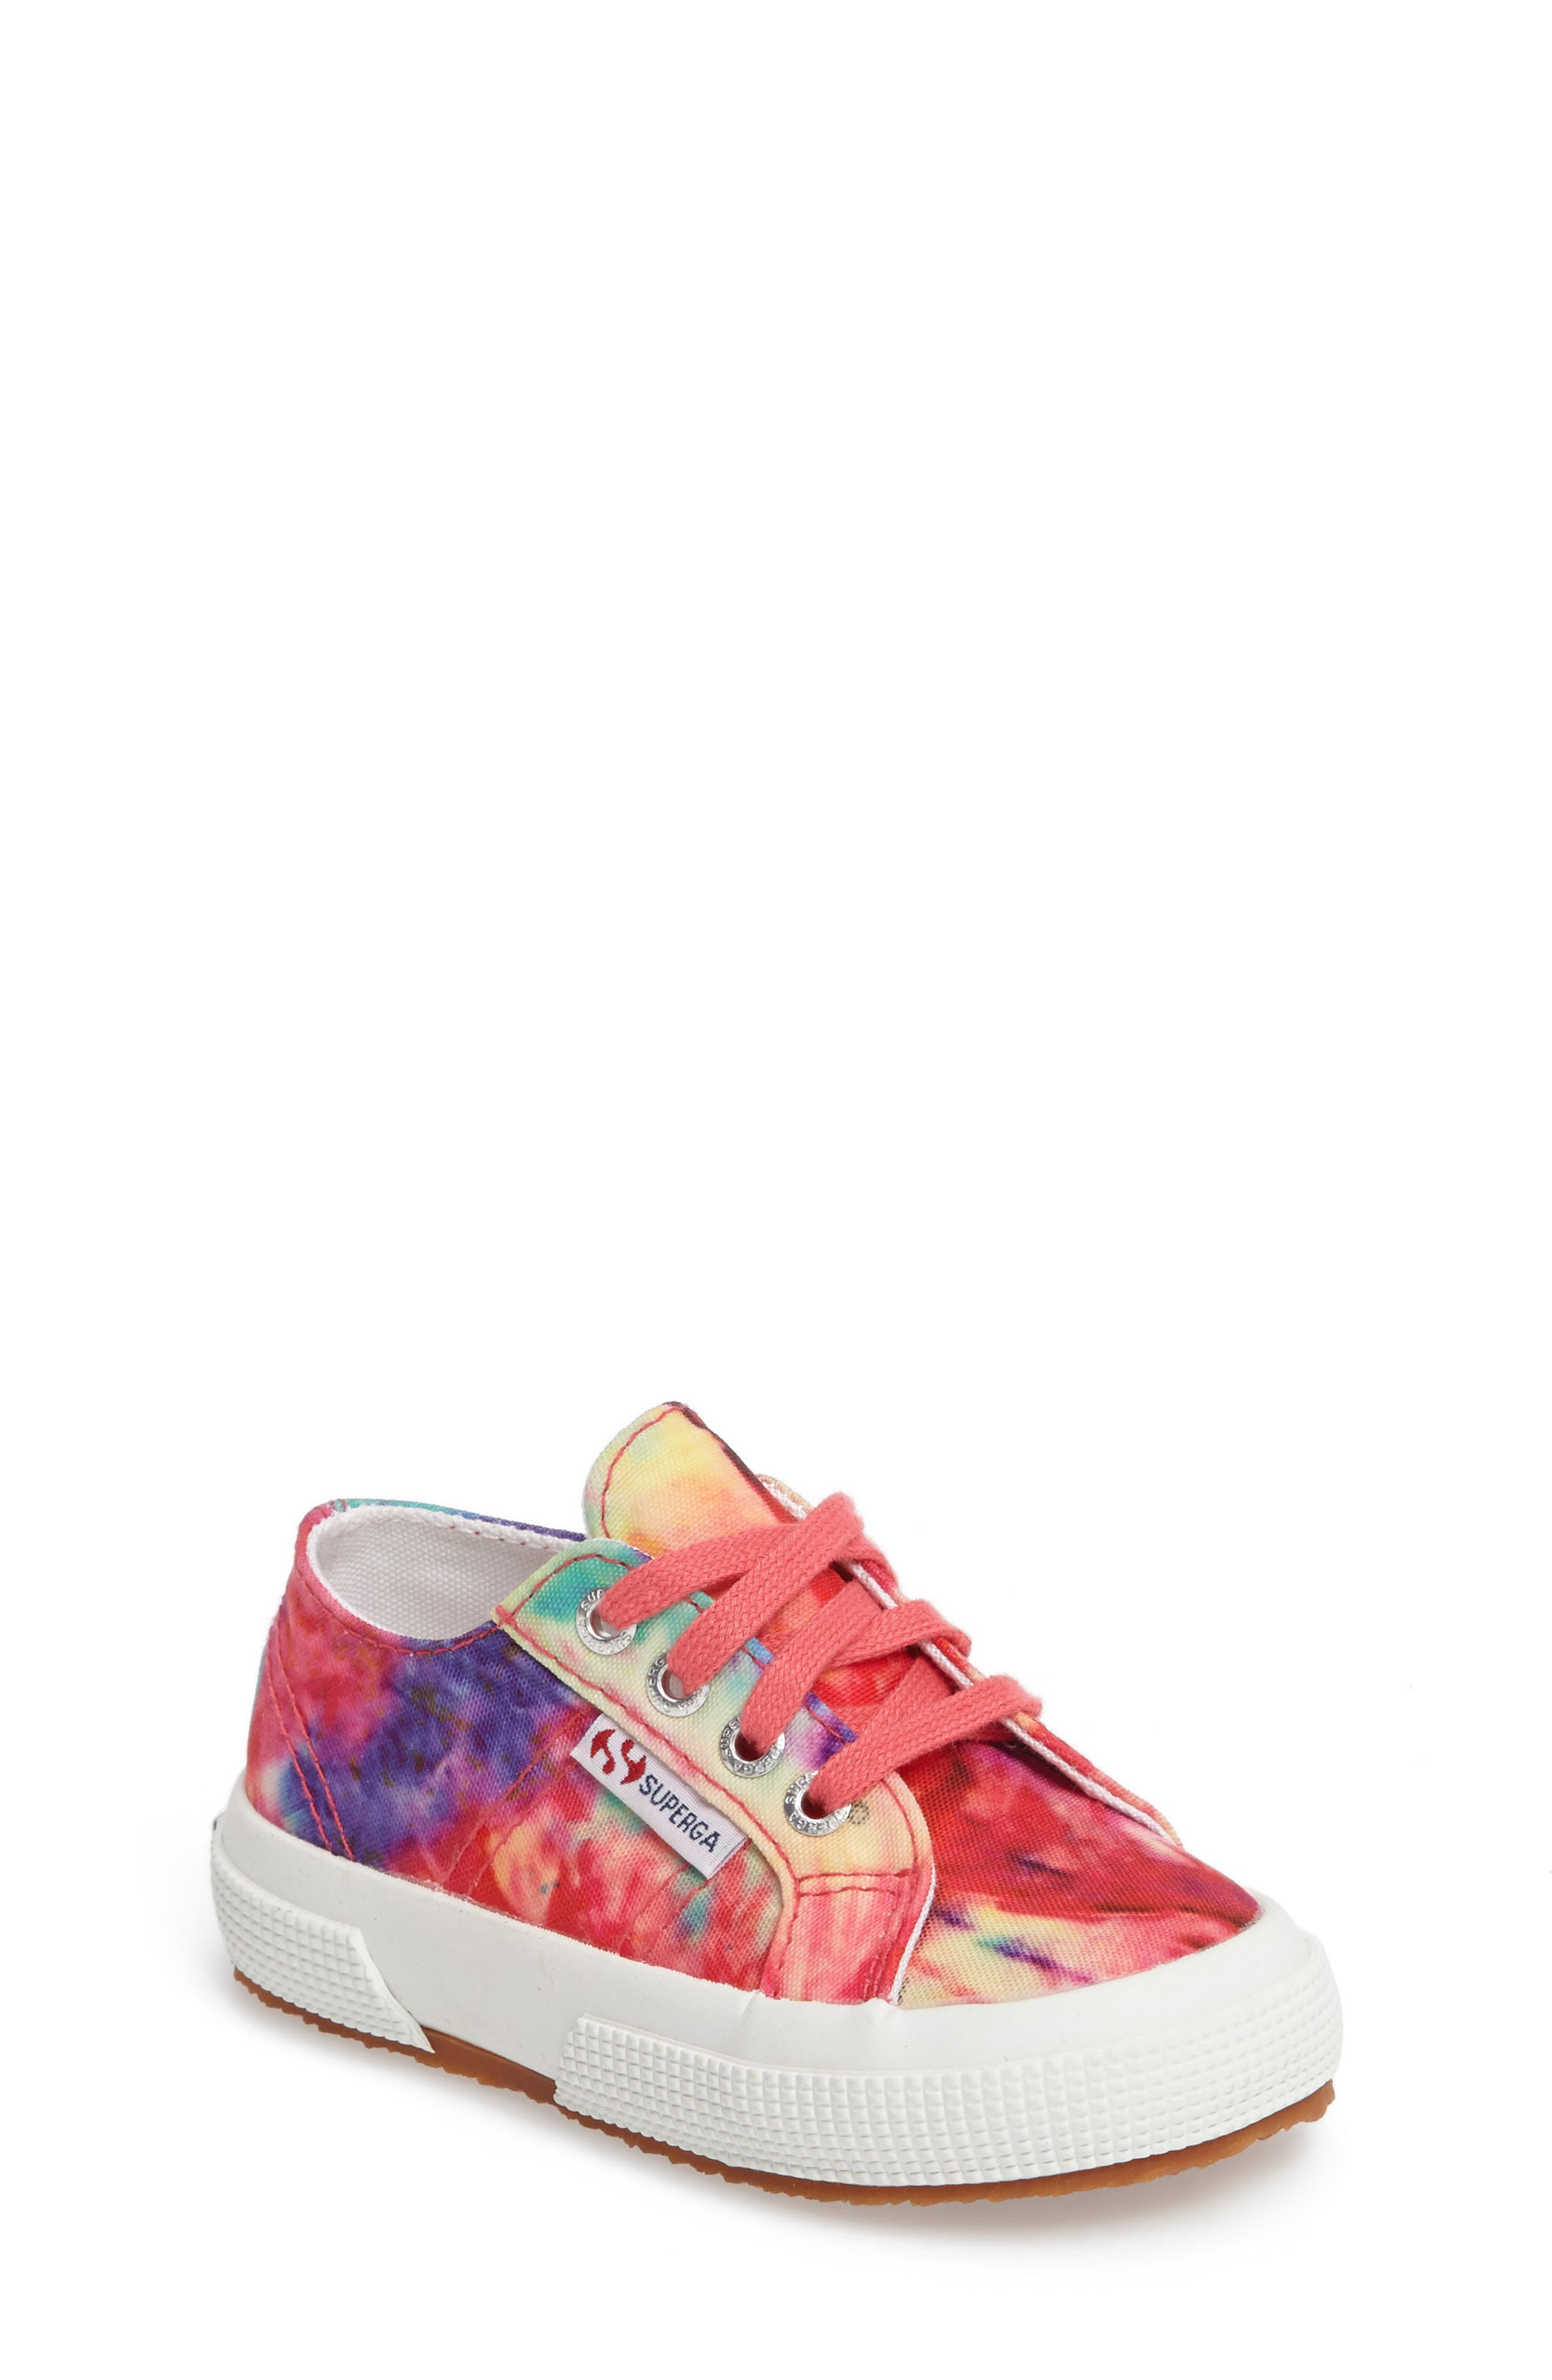 Tie Dye Classic Sneaker,                             Main thumbnail 1, color,                             807